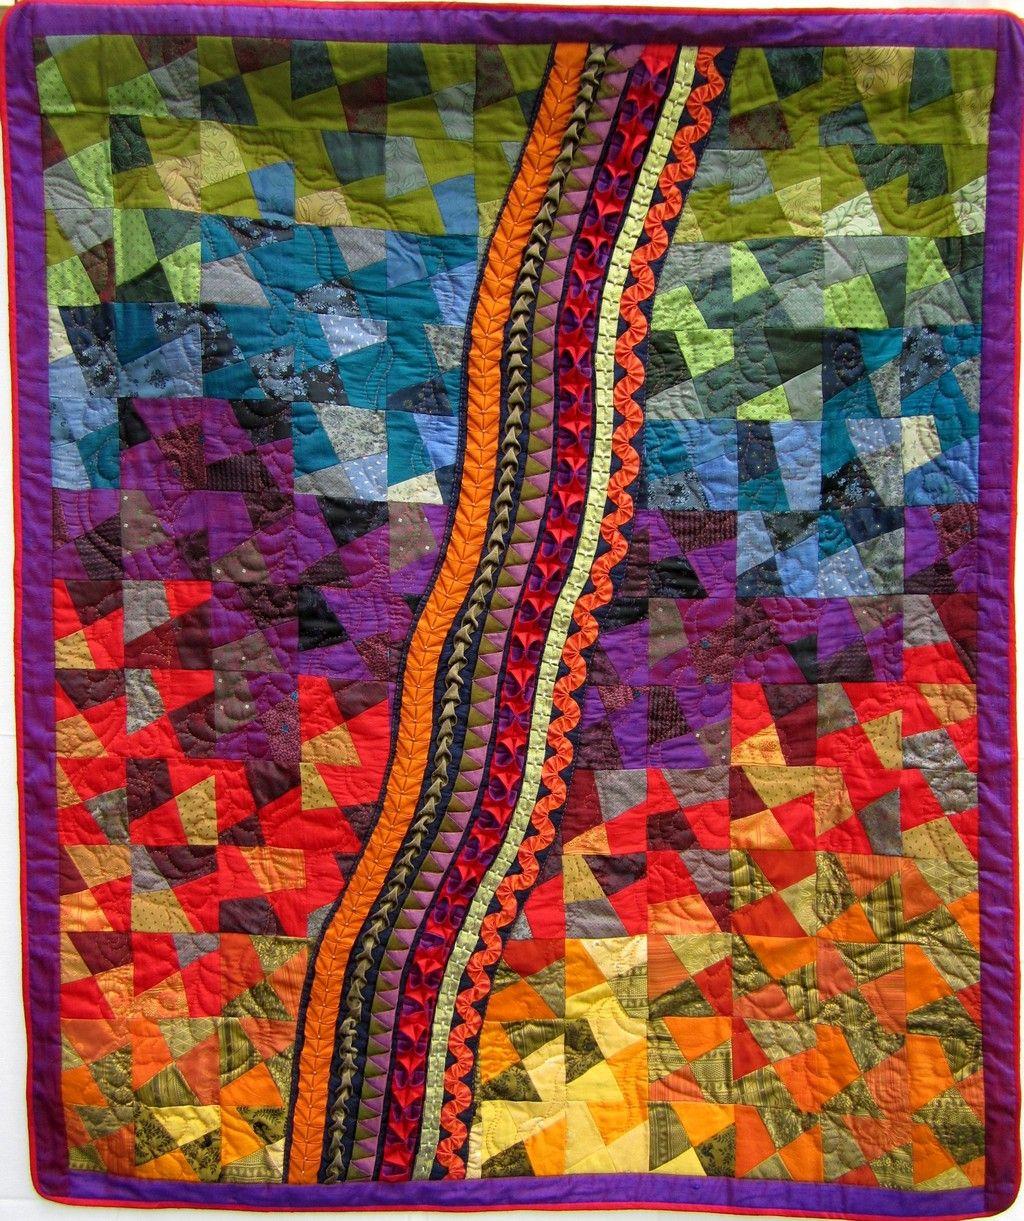 Elisabeth Skala Quilt Patchwork Gilde Austria Seite 3 Colorful Quilts Fabric Painting Quilts